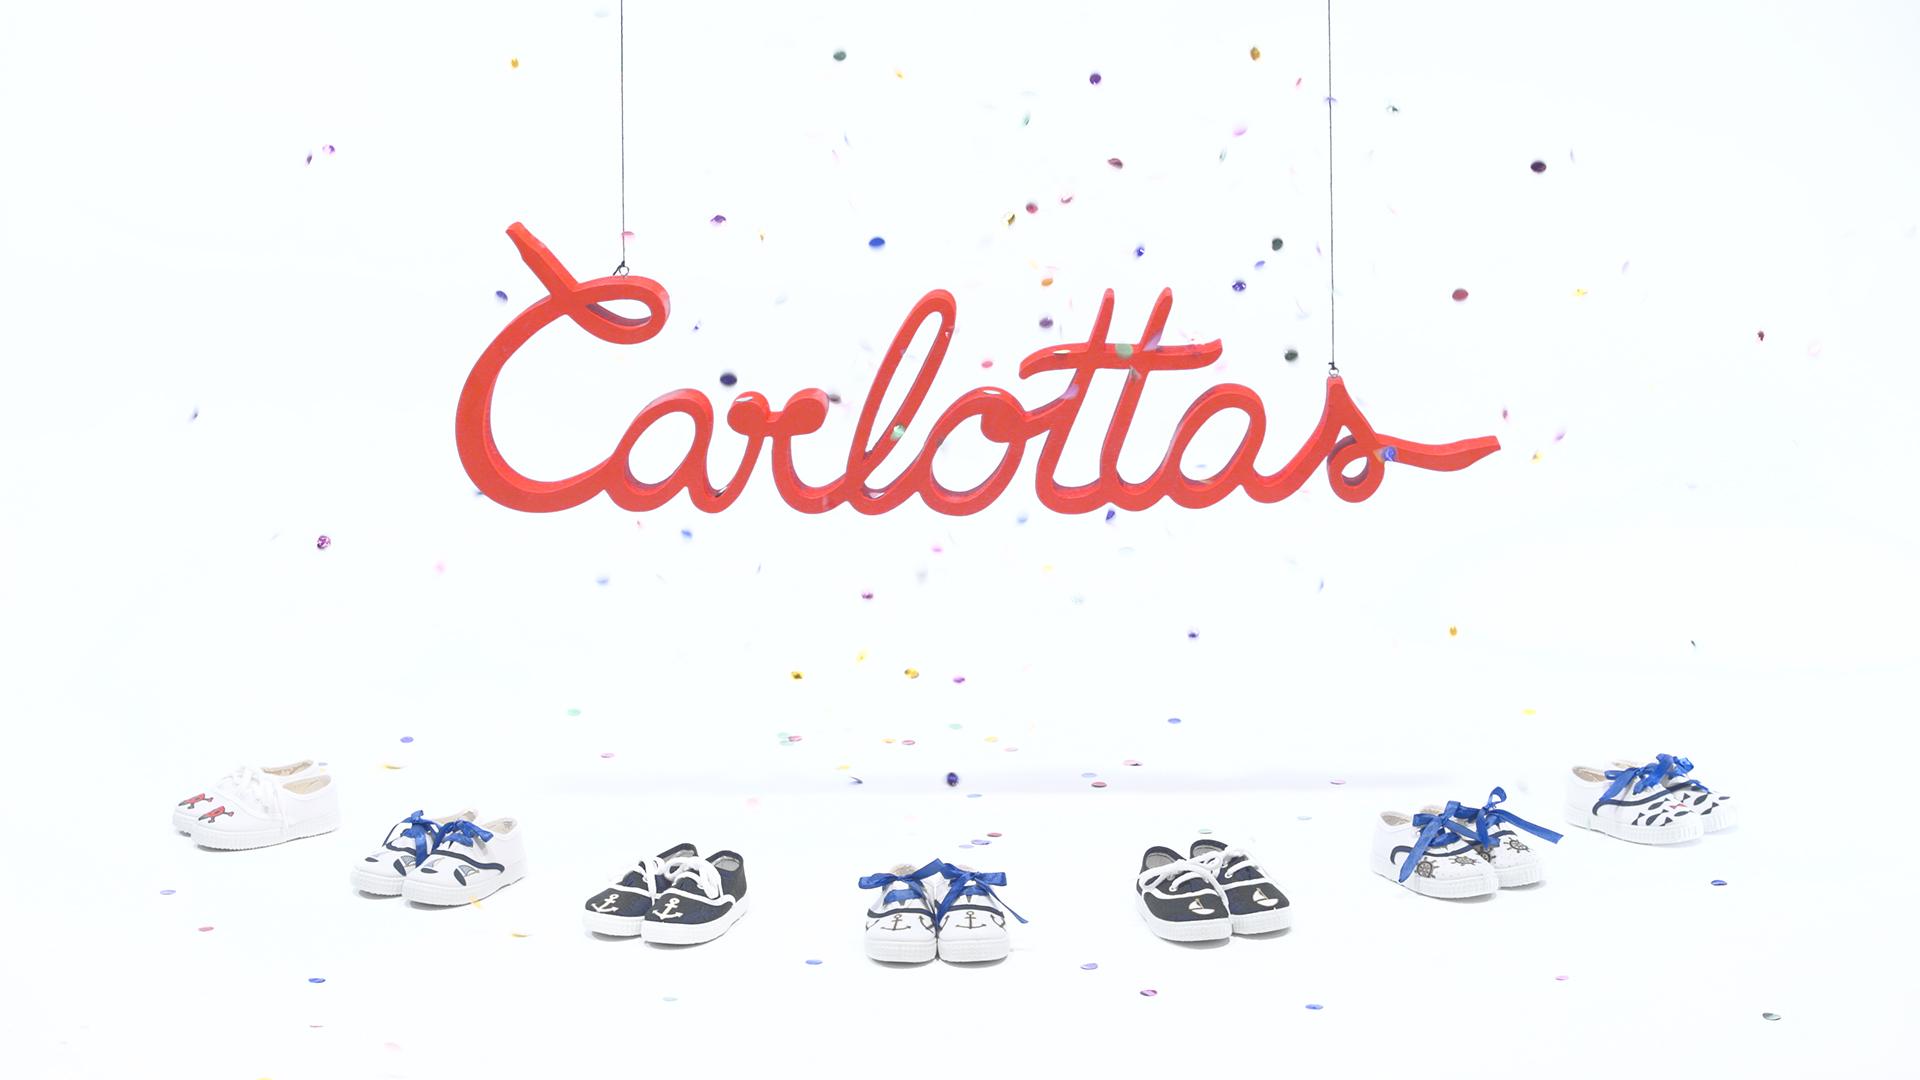 Carlottas